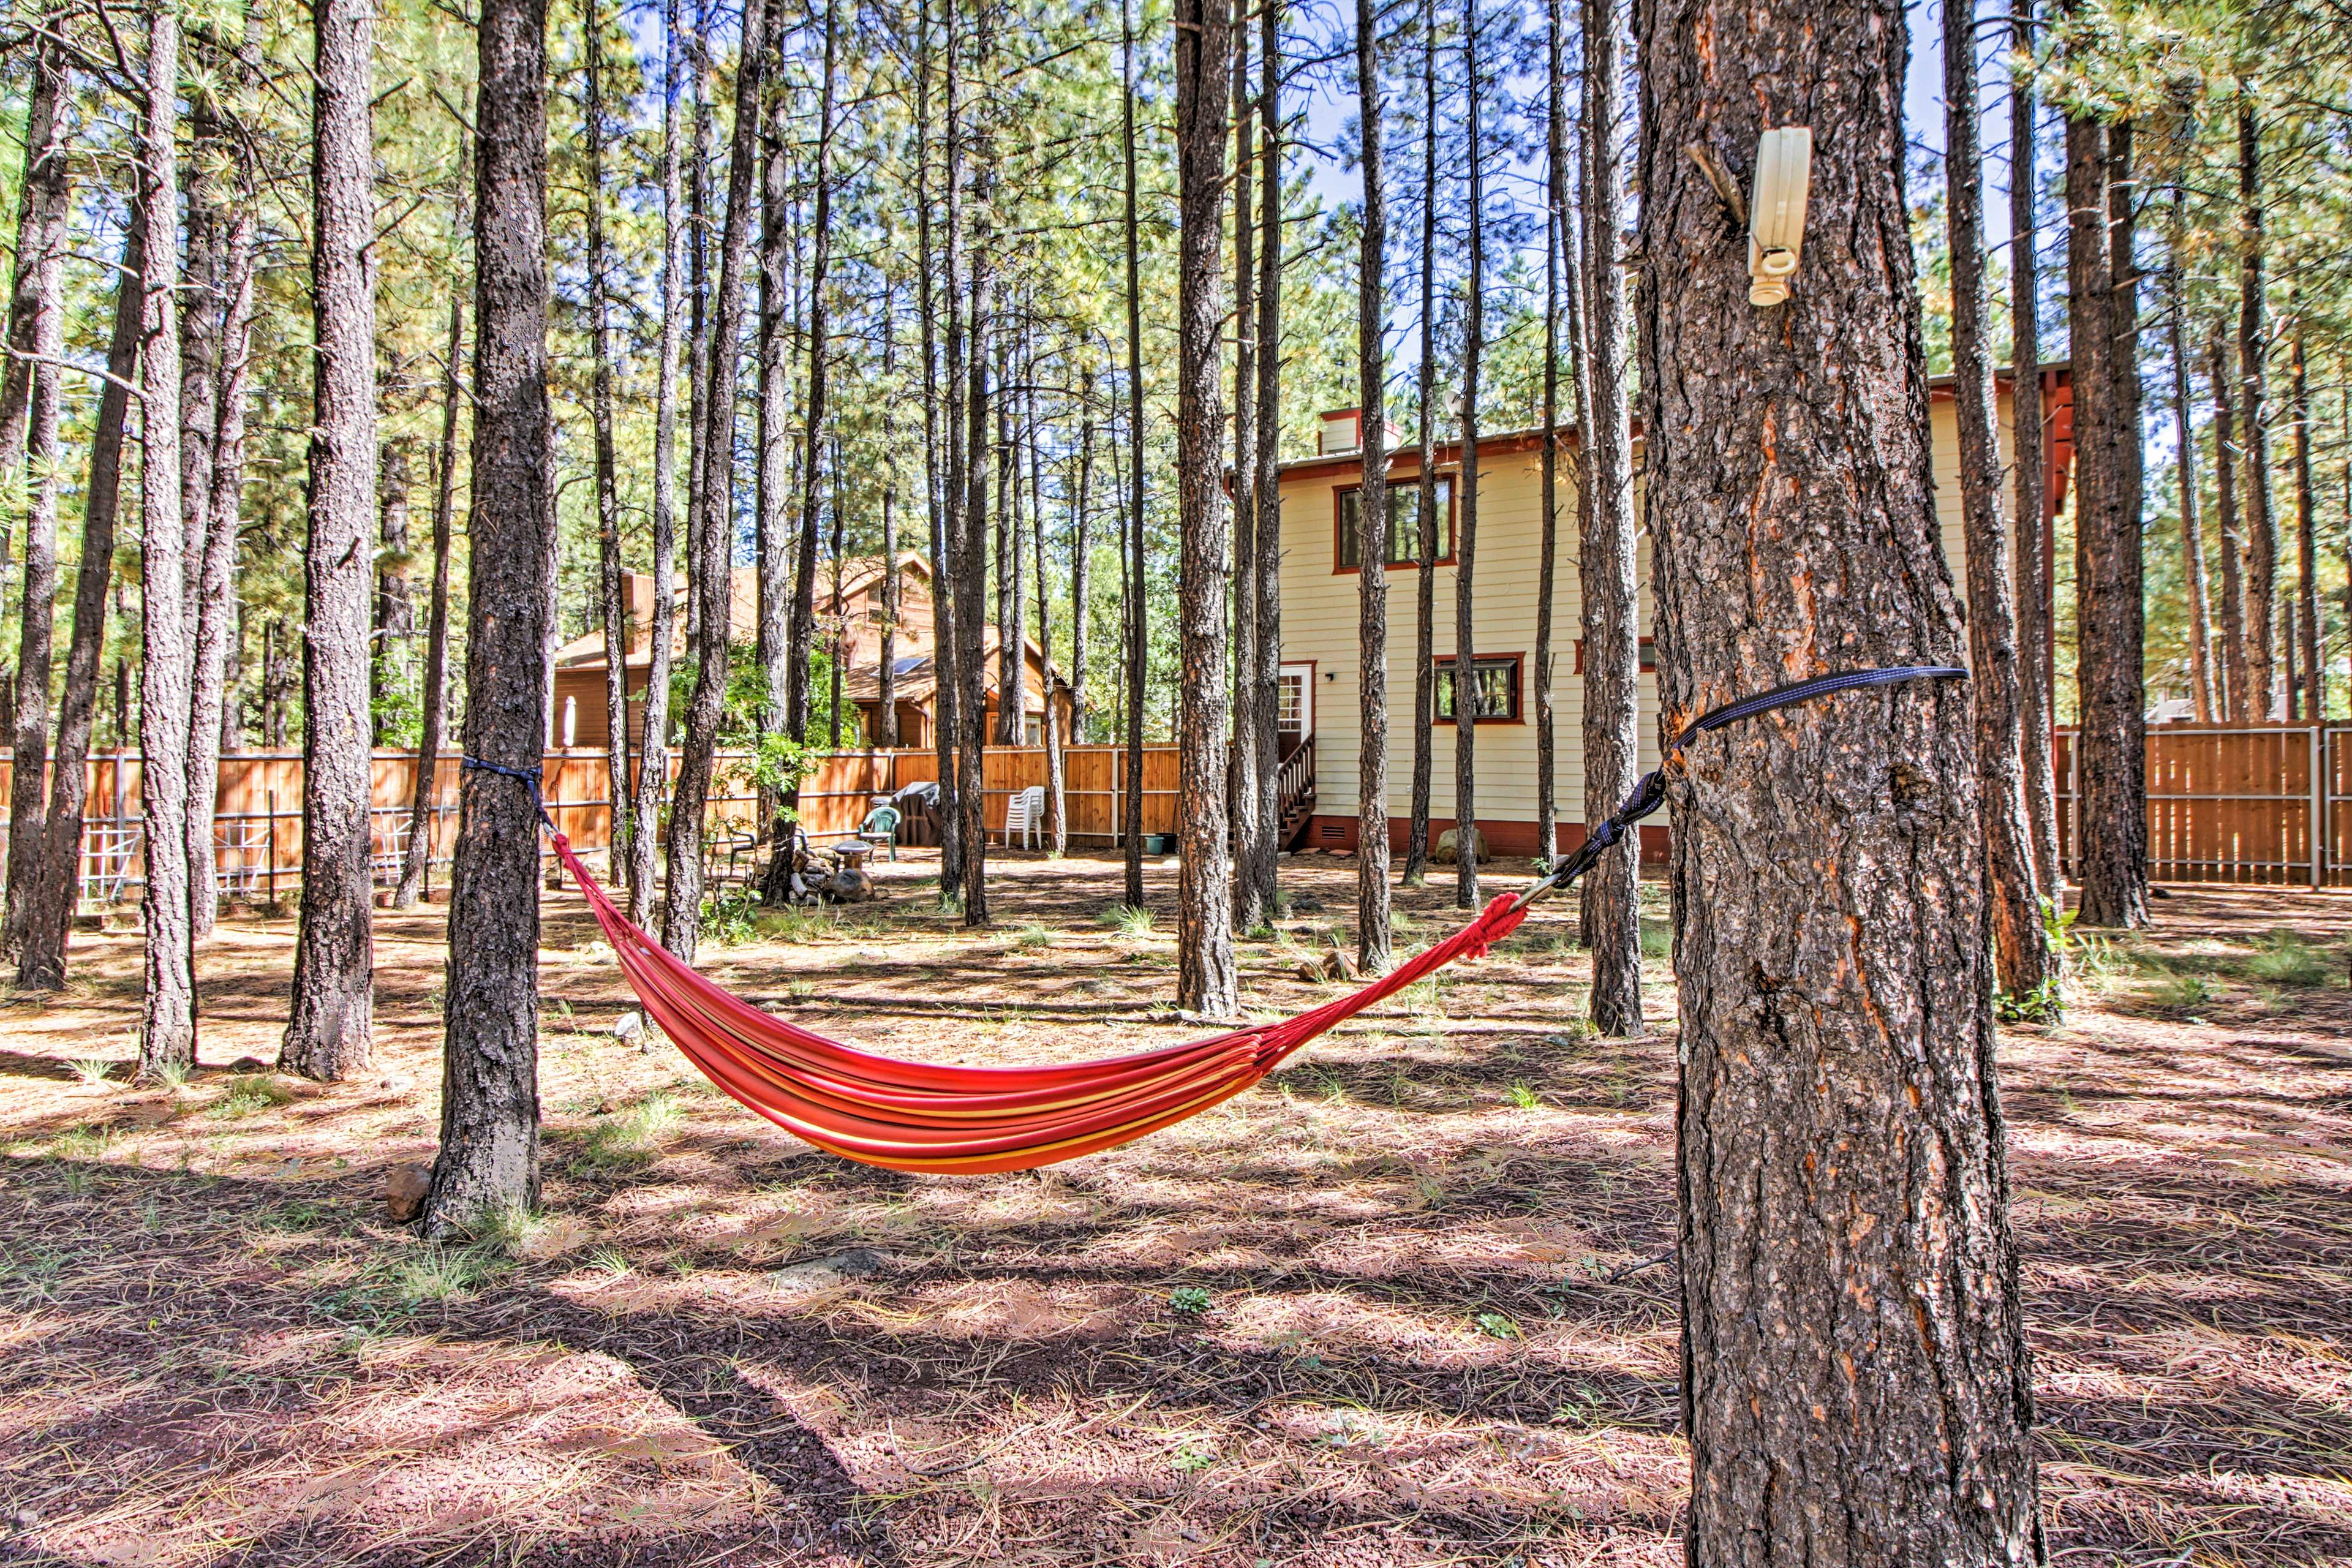 Take a catnap in the hammock.